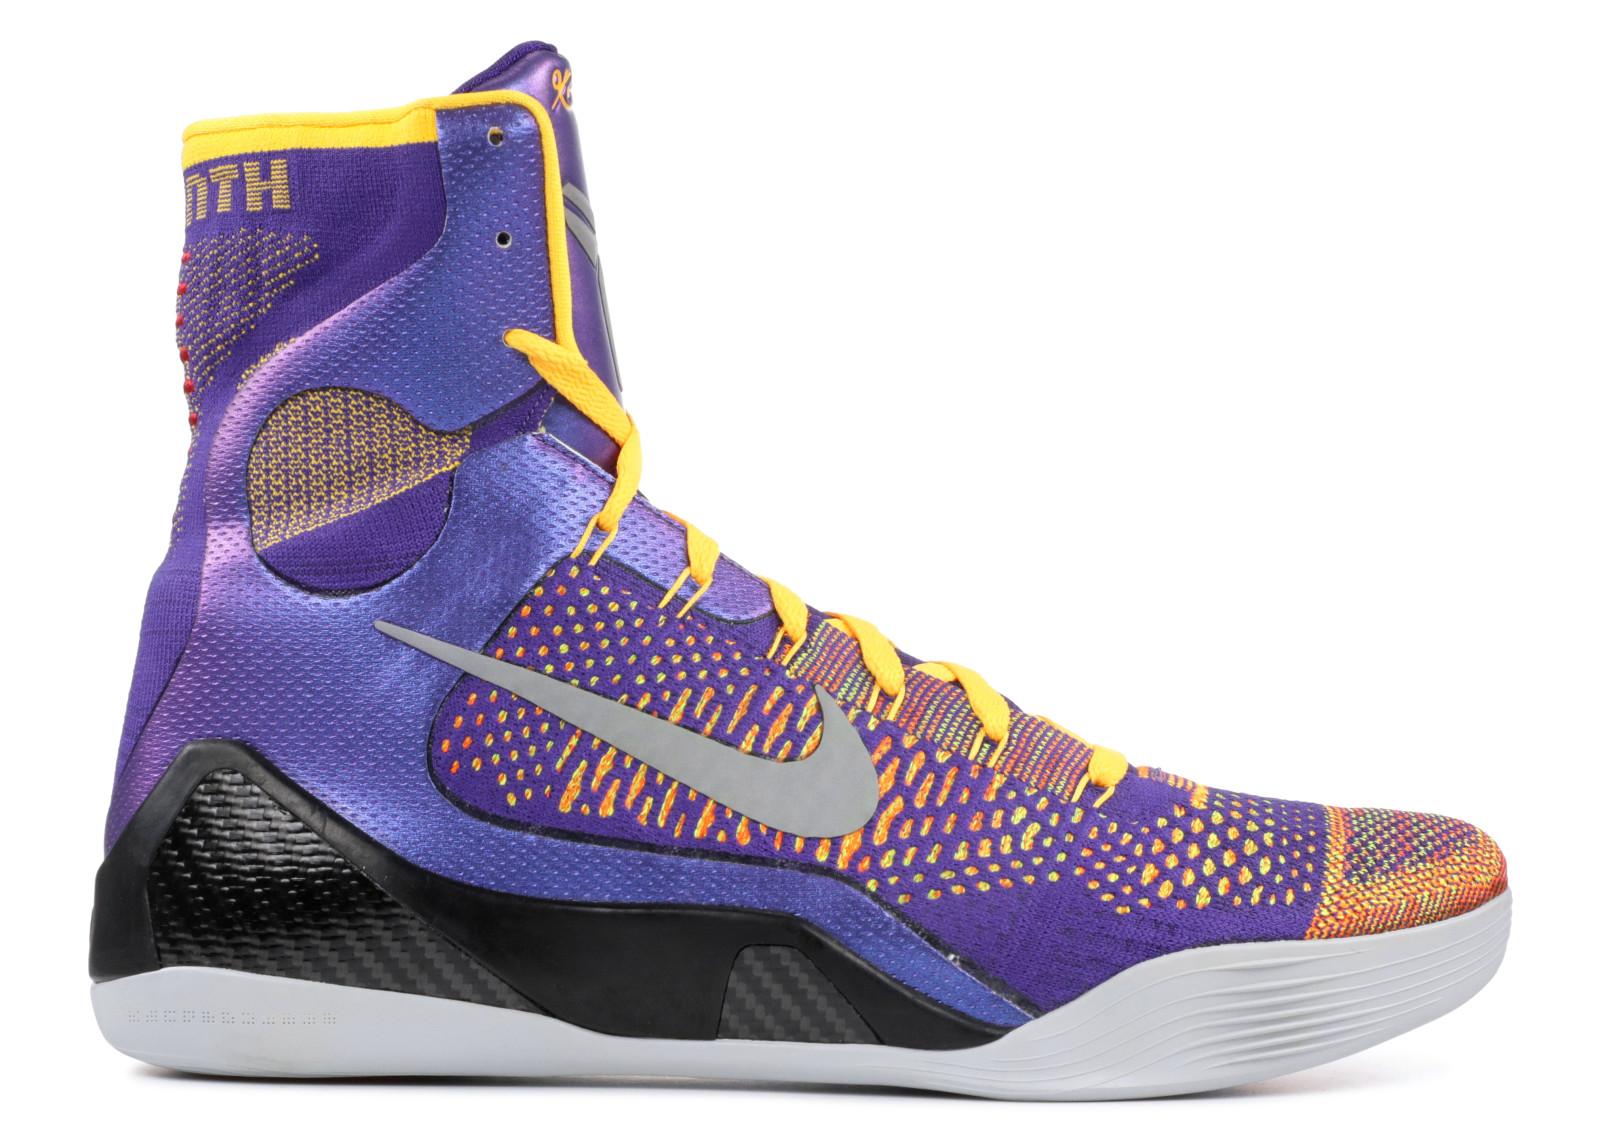 Nike Kobe 9 Elite Team Showtime